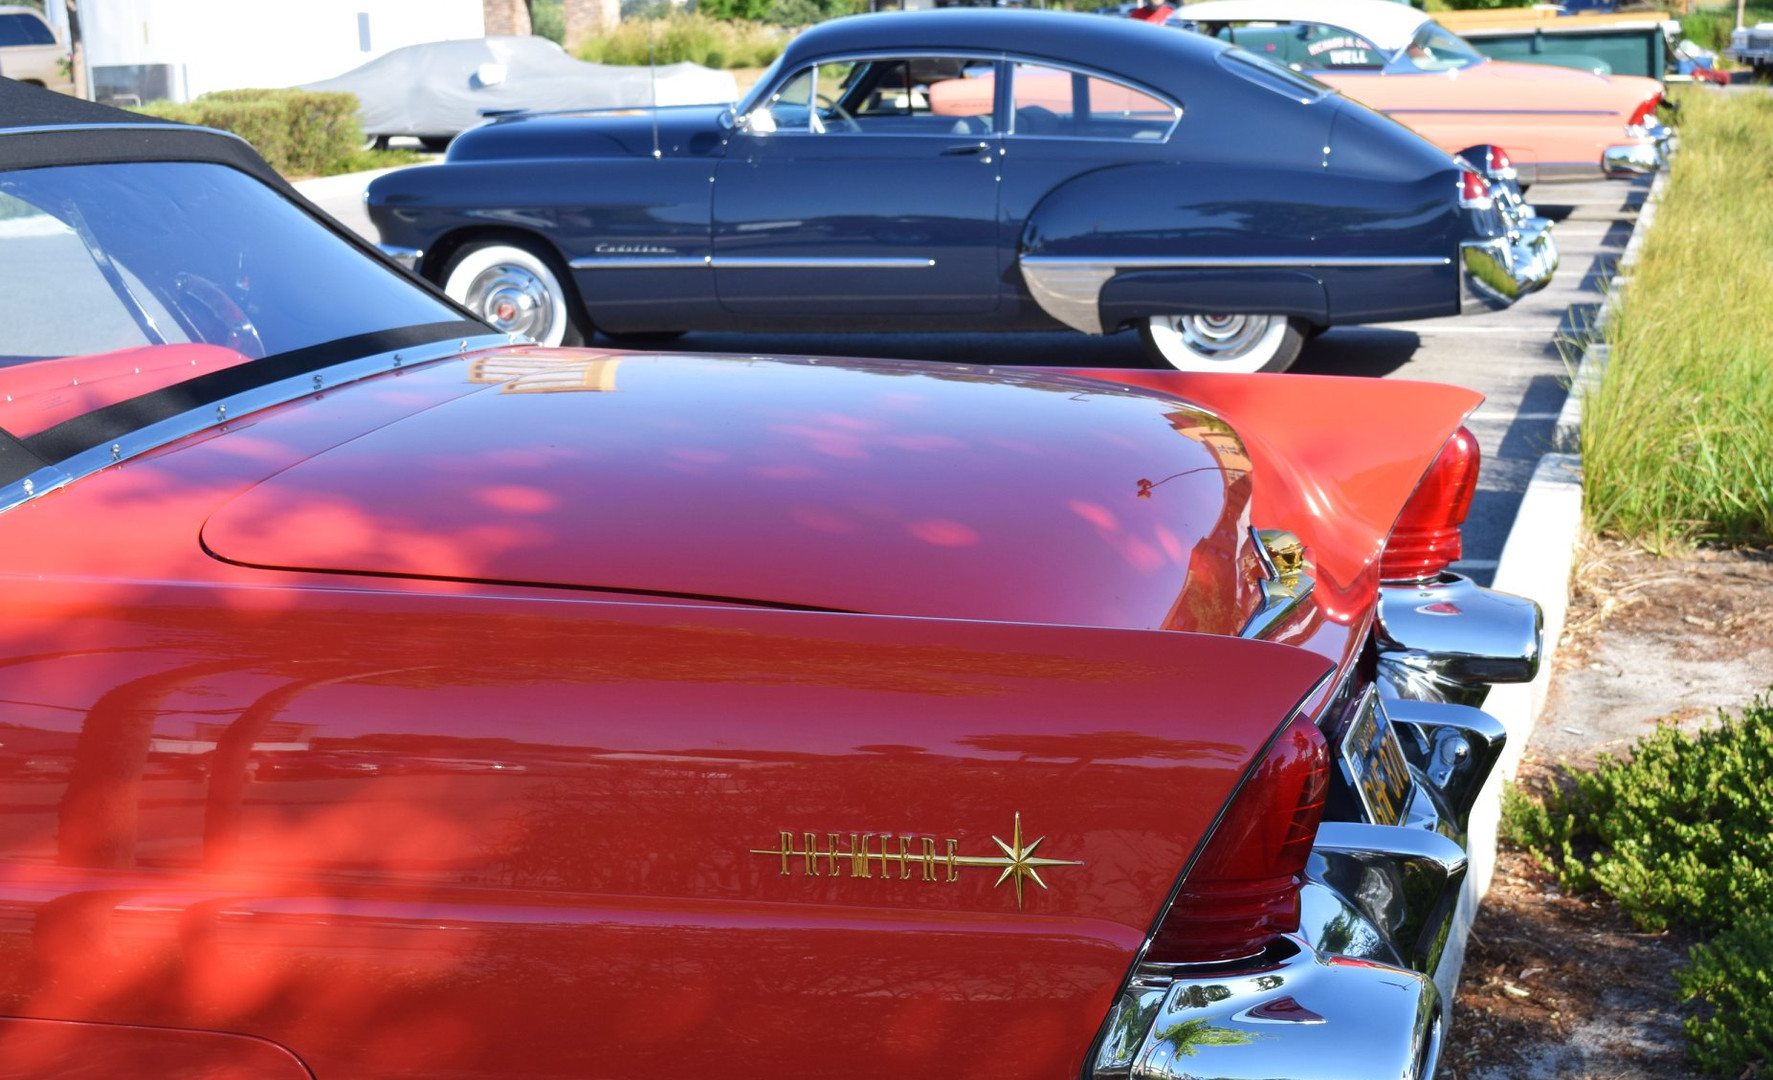 Car Show - Comparing Fins.jpg